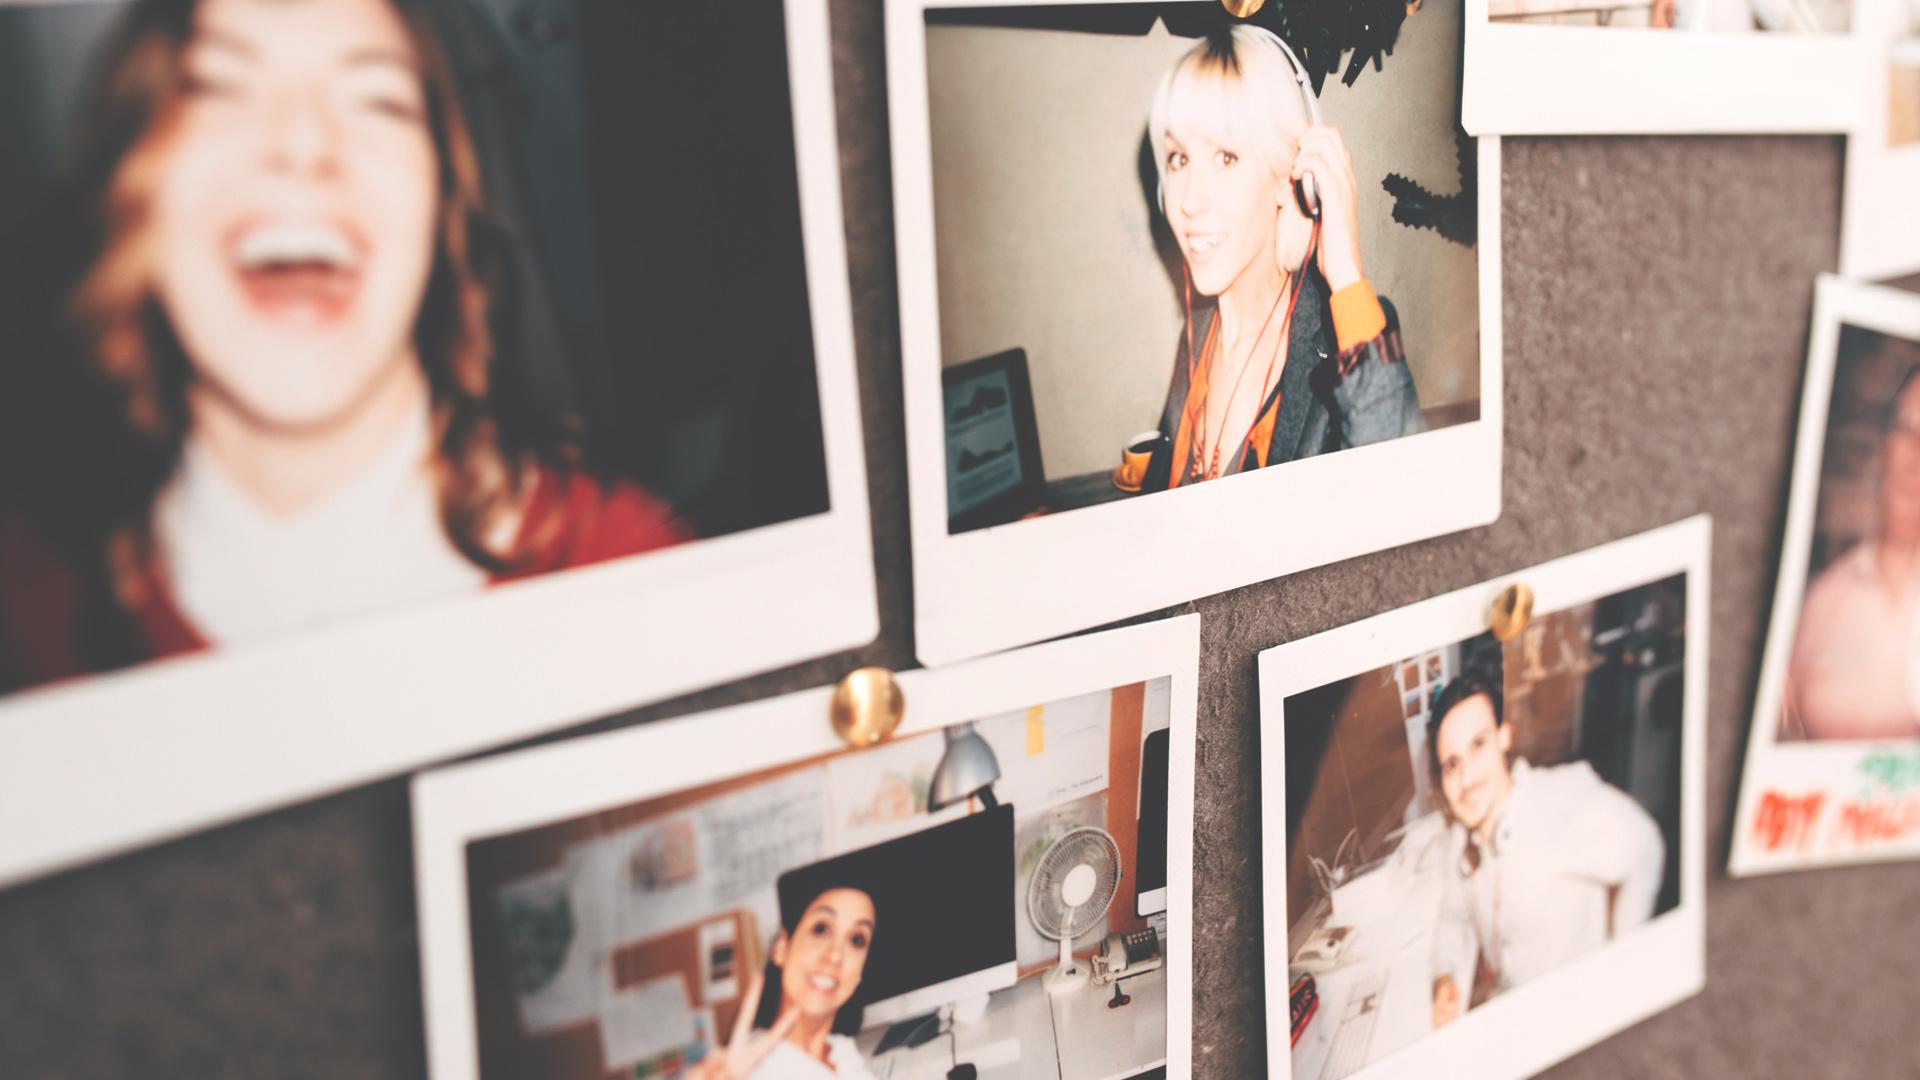 Instant Polaroids of business team portraits at work having fun